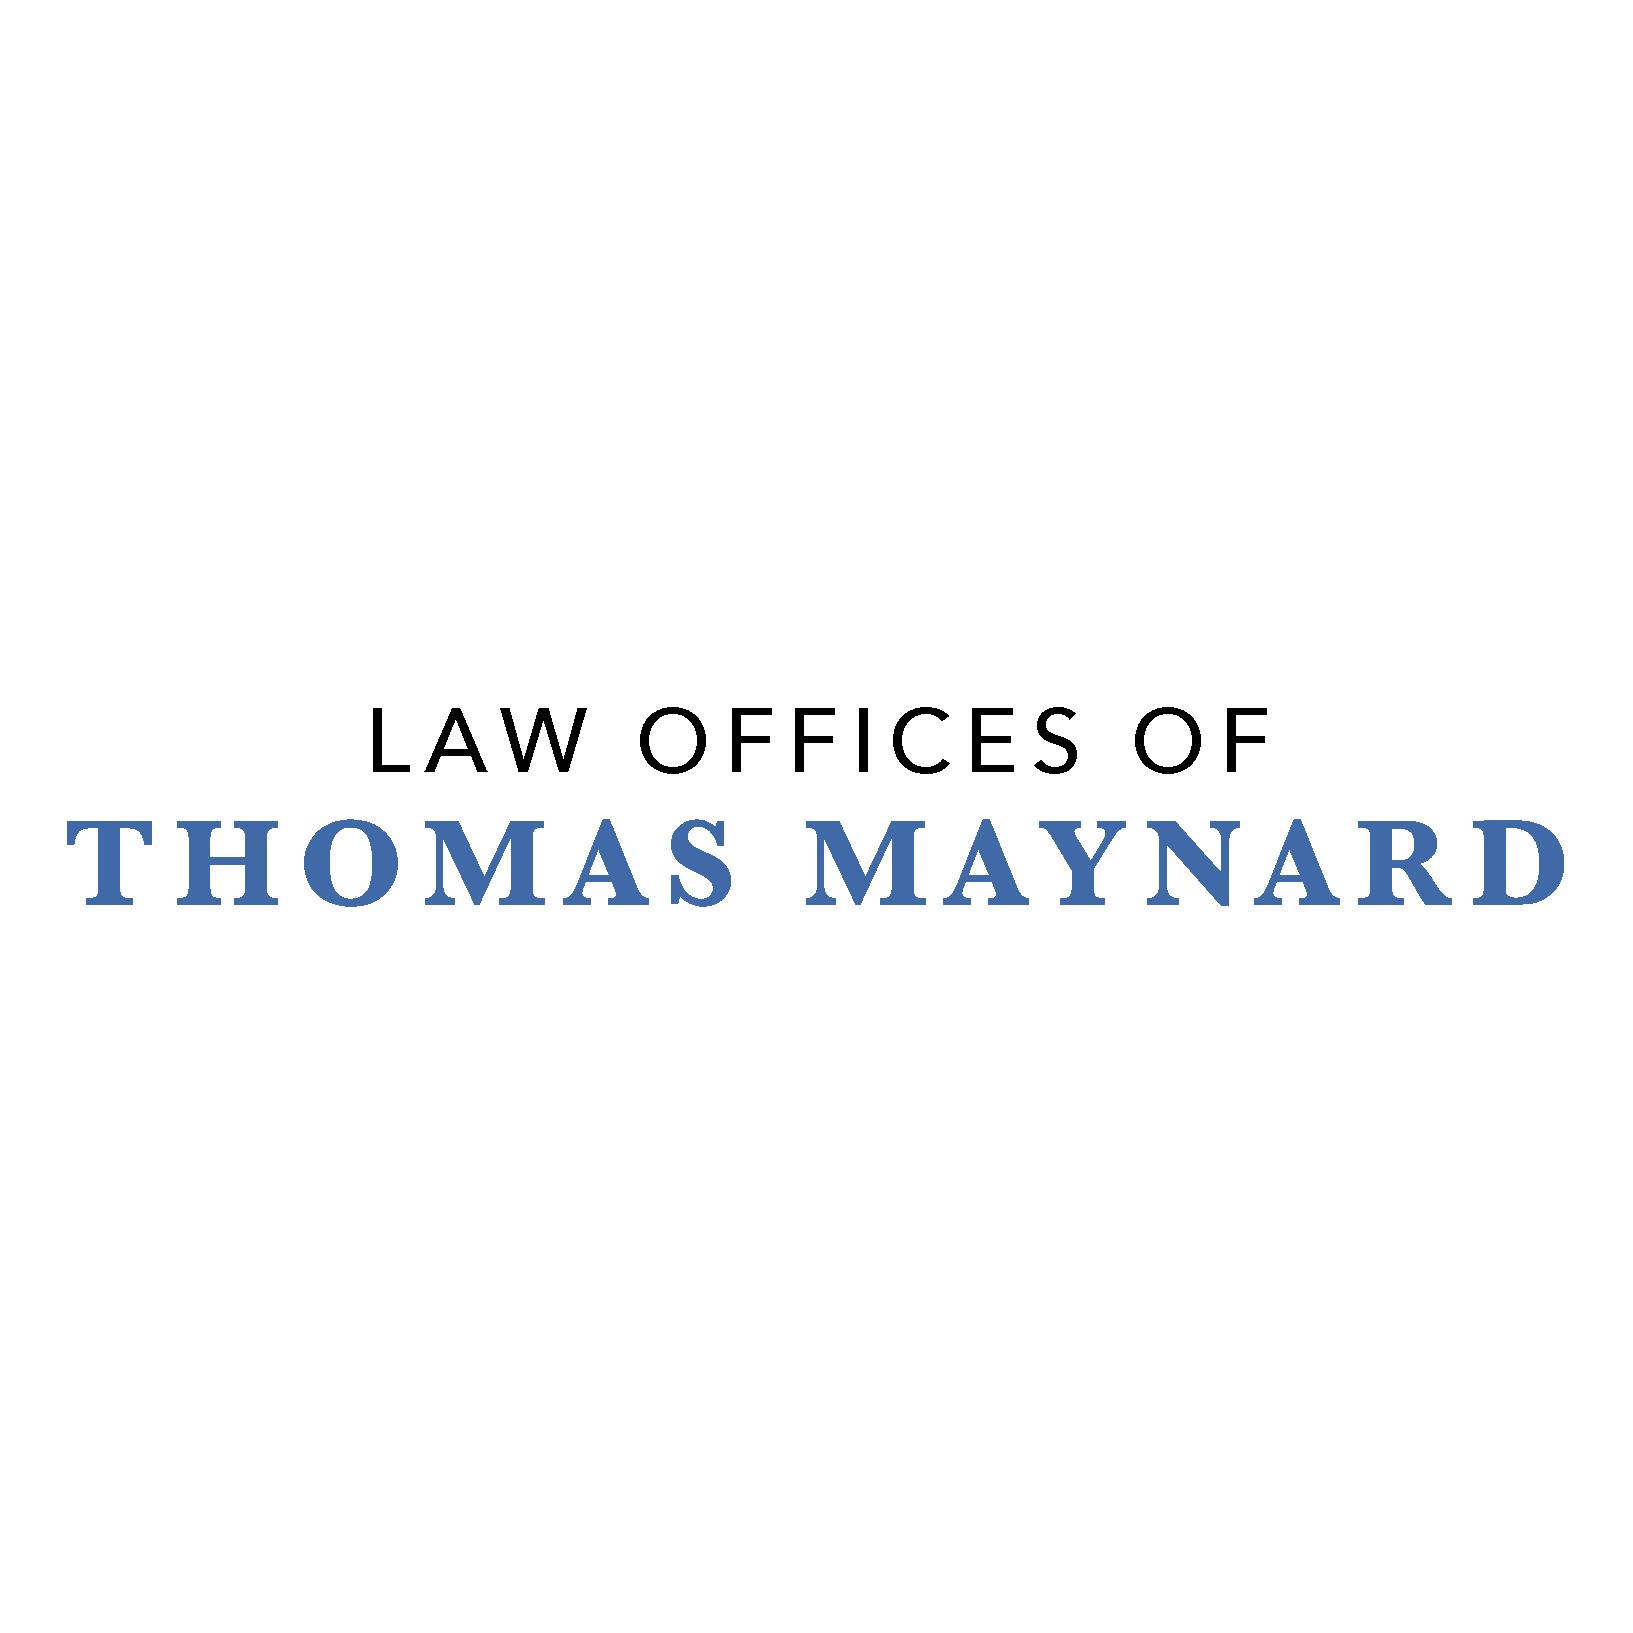 Law Offices of Thomas Maynard